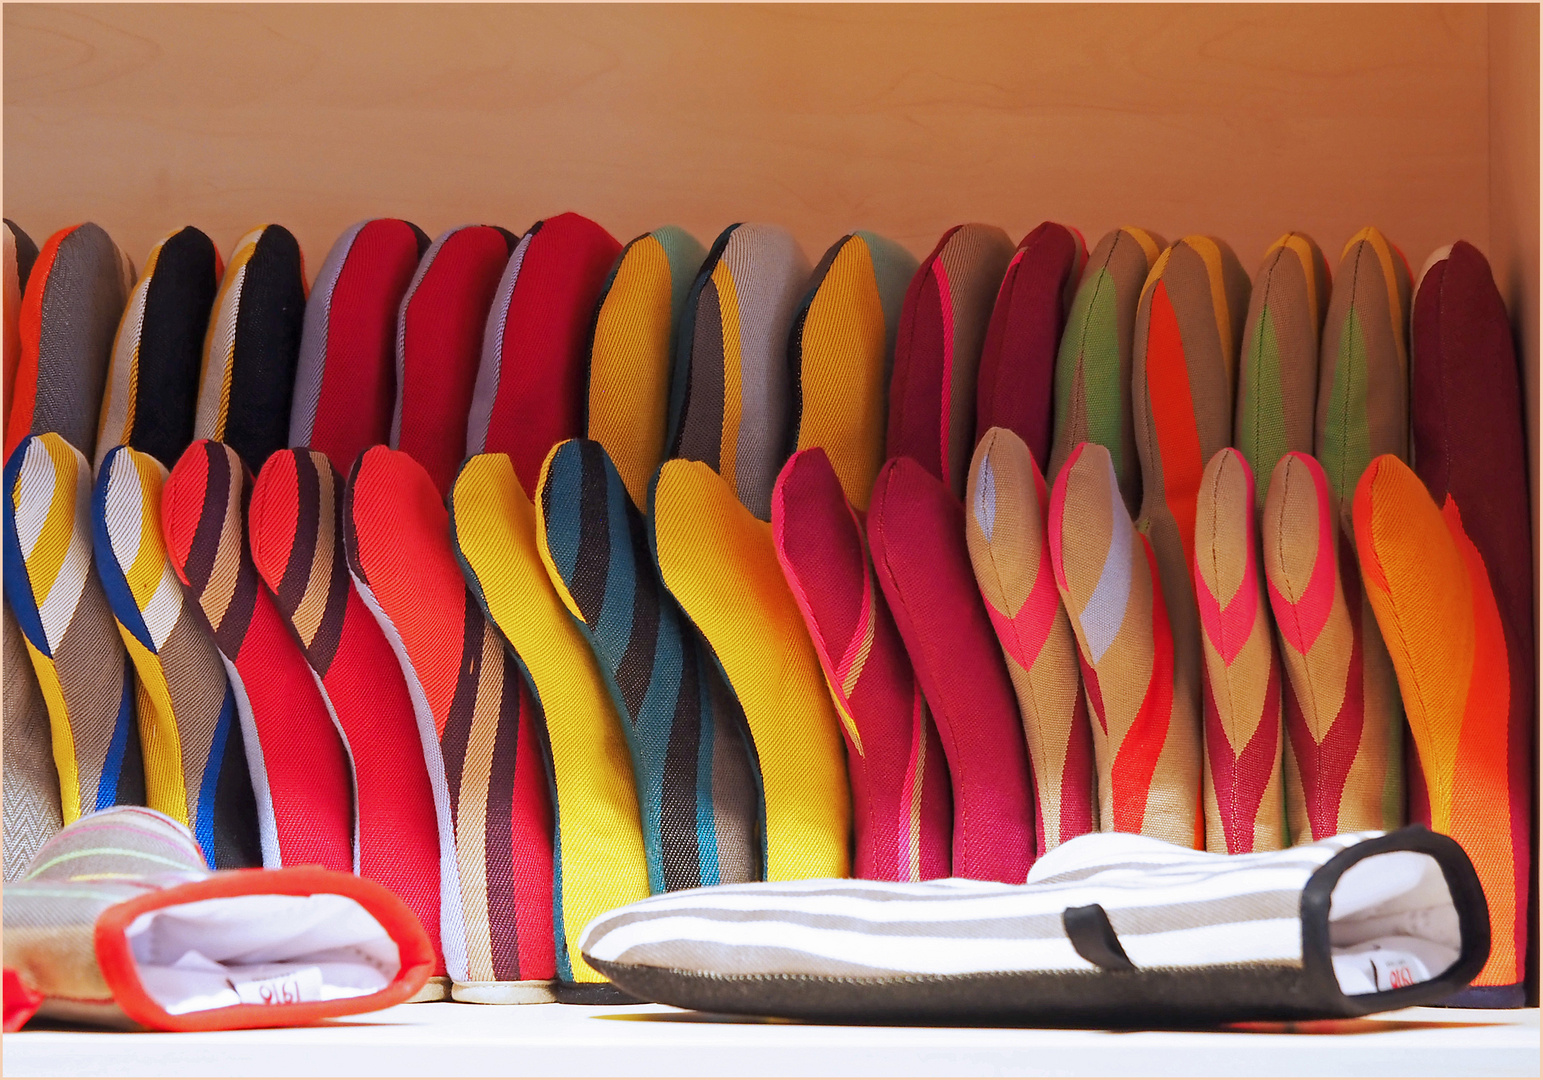 Gants de cuisine en toile Basque